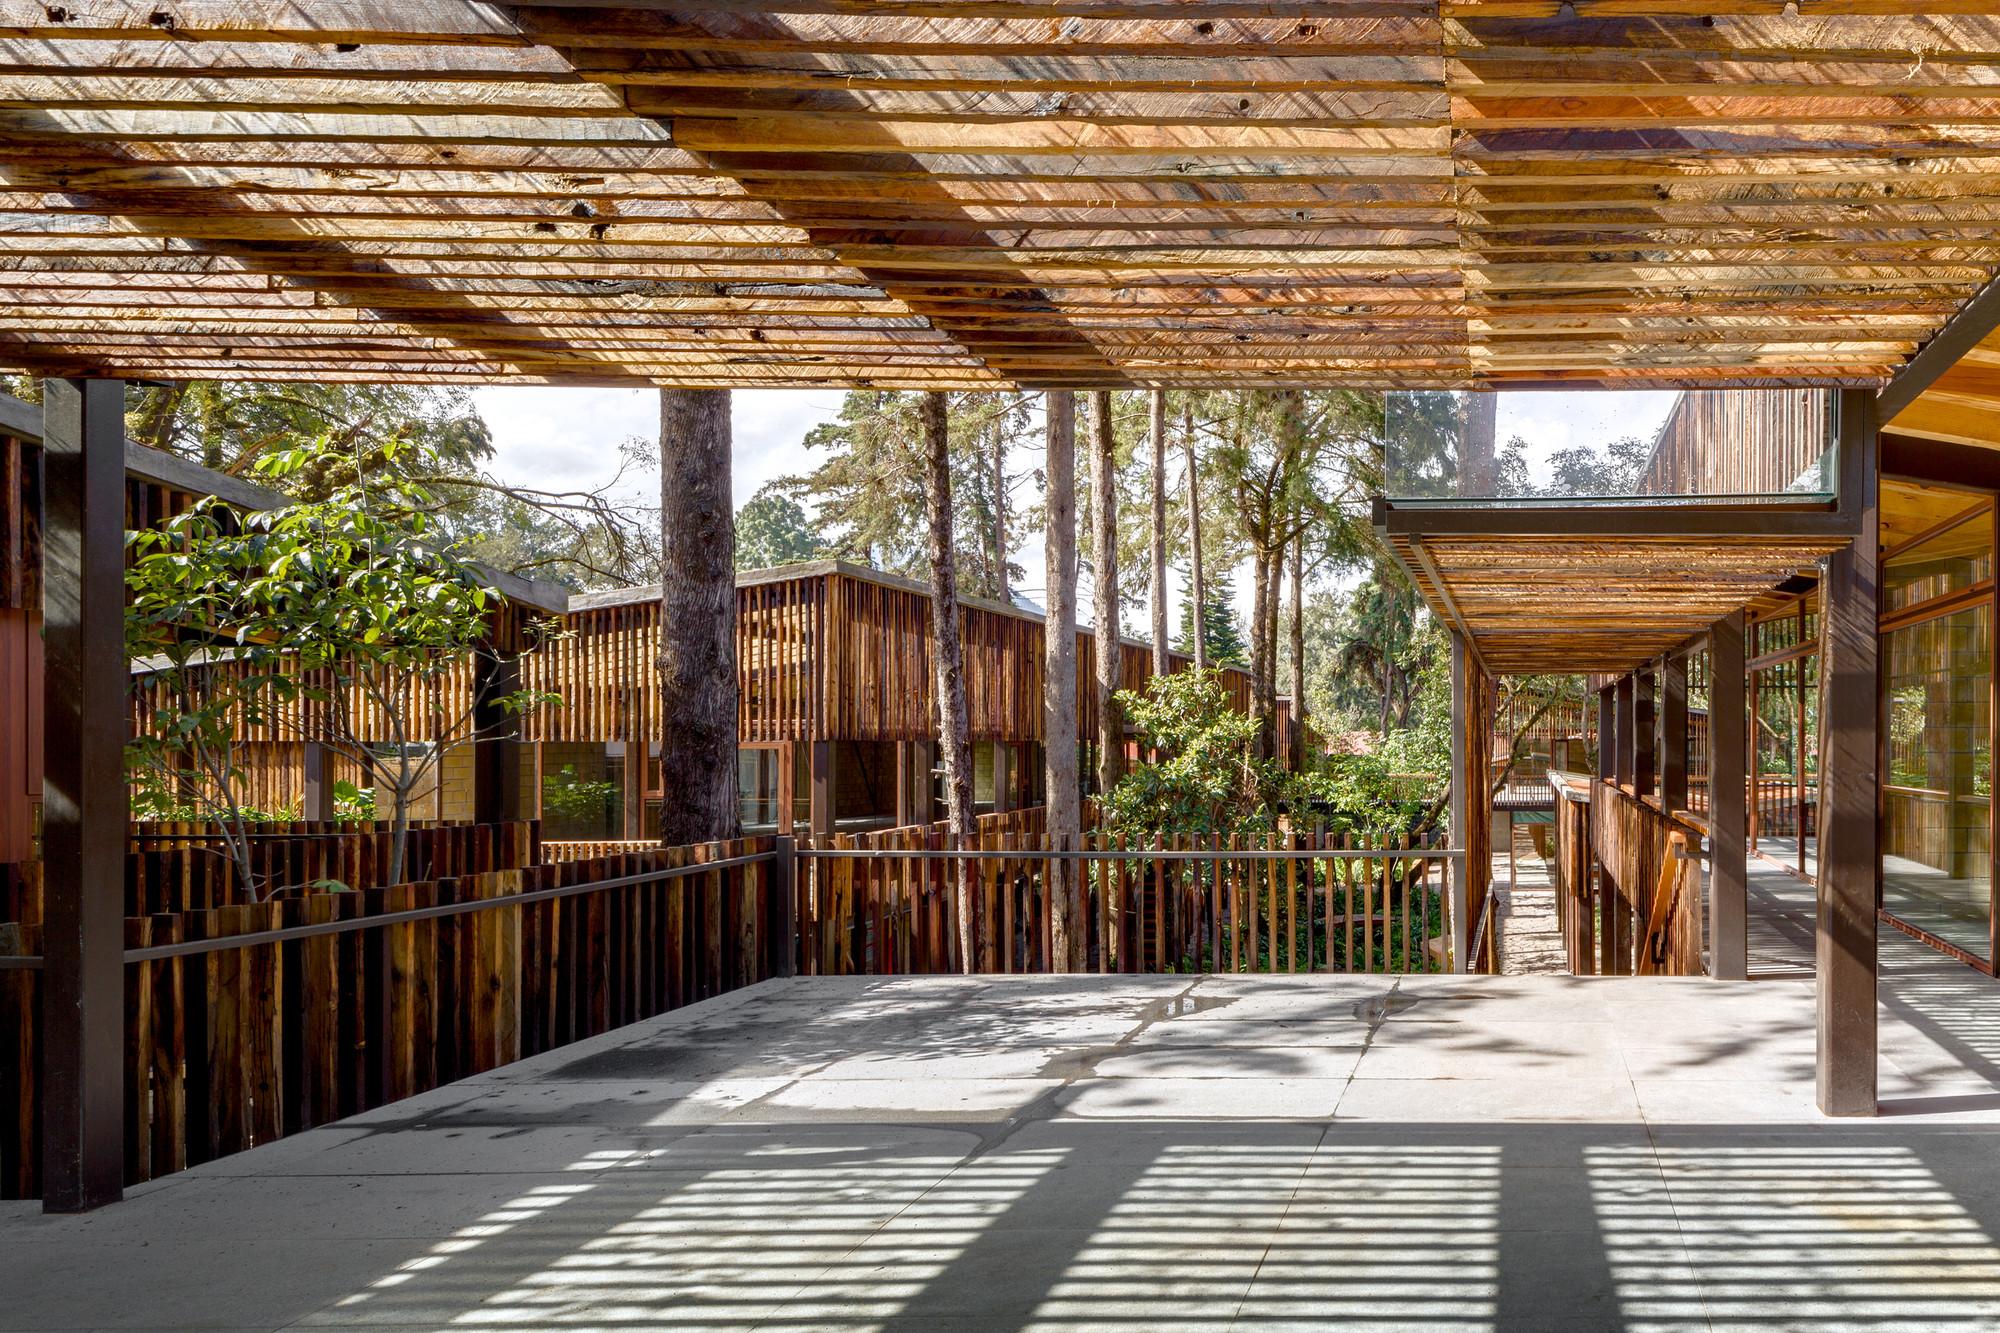 Galer a de arquitectura y paisaje plaza andaro construida for Arquitectura del paisaje